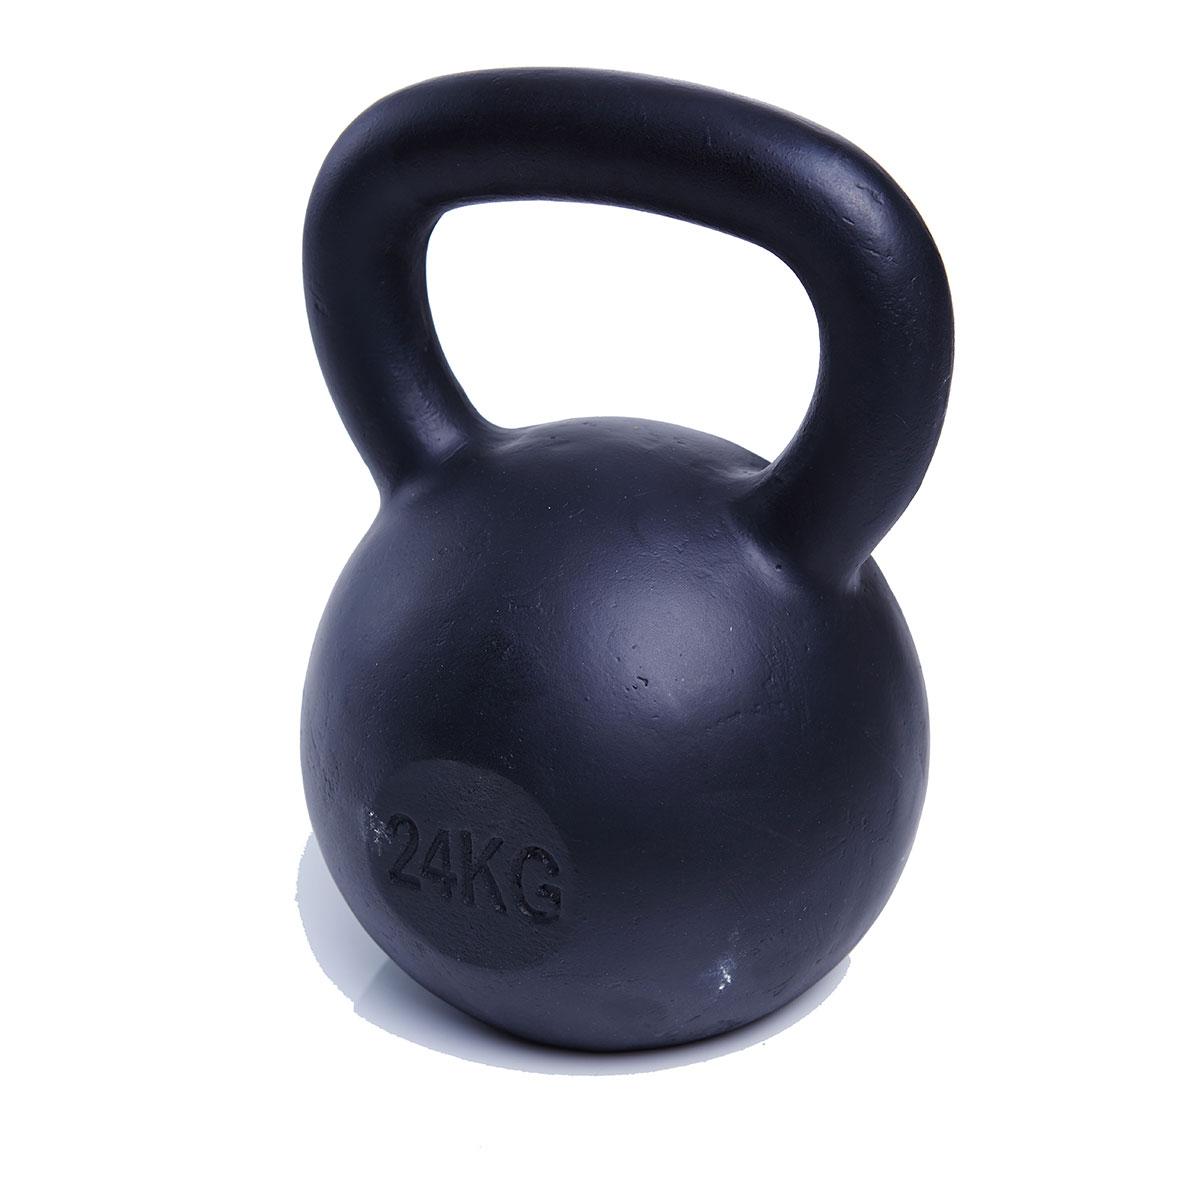 Kettlebell 24,00kg Wellness